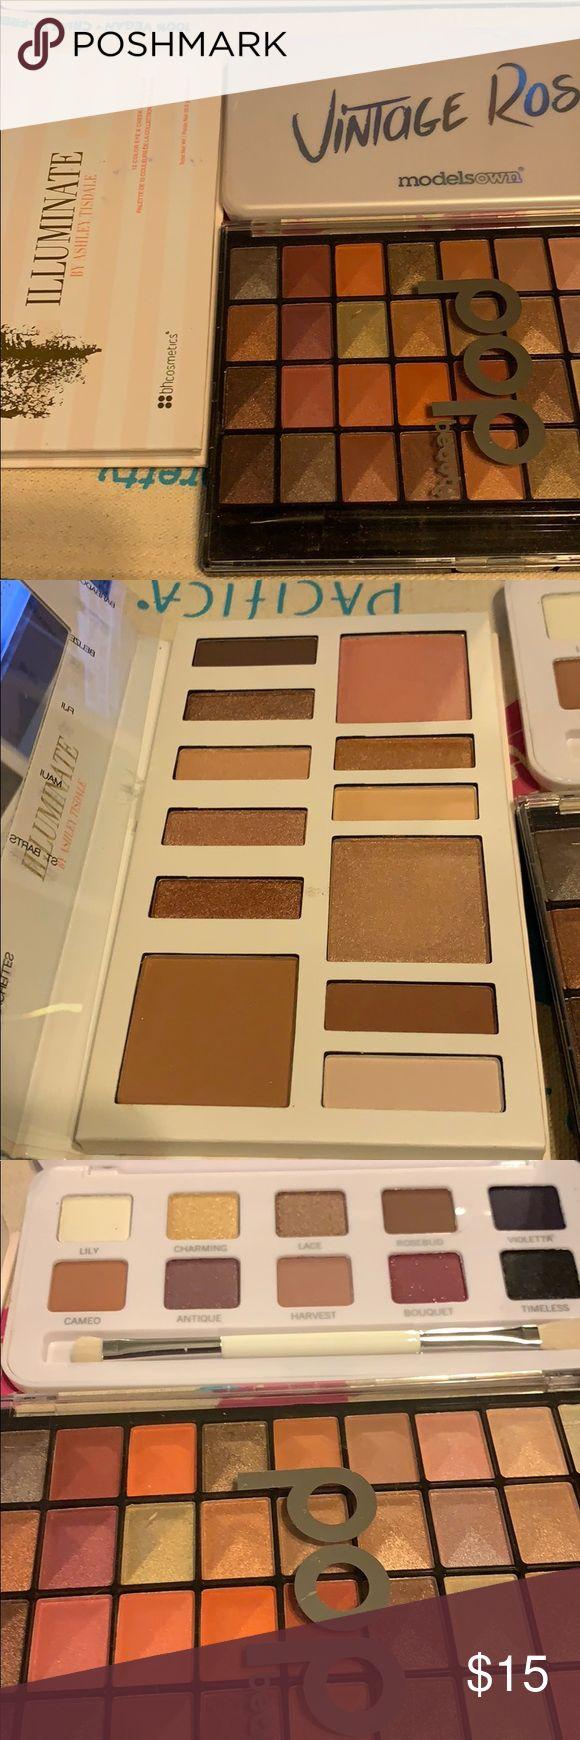 New bundle NWT Bh cosmetics, Beauty pop, Ashley tisdale